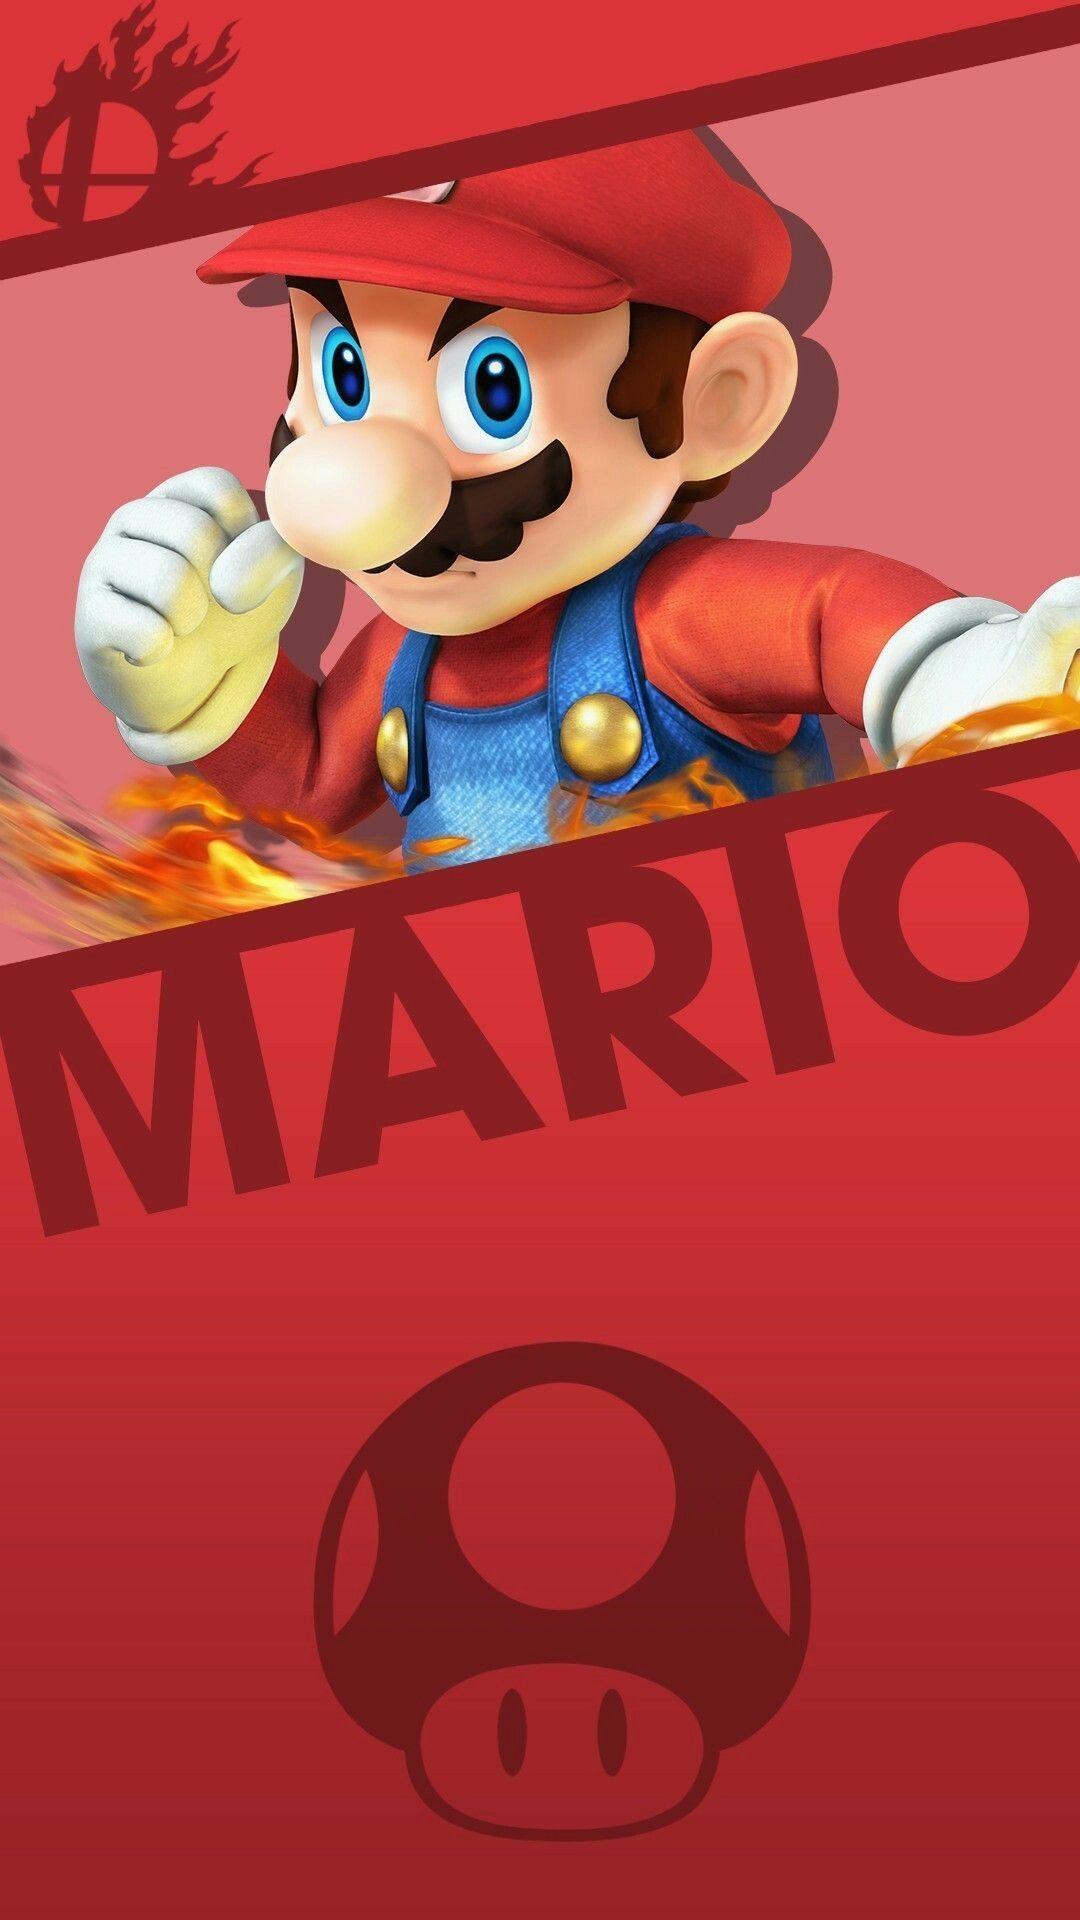 Best Of Mario Wallpaper iPhone Mario bros fondos